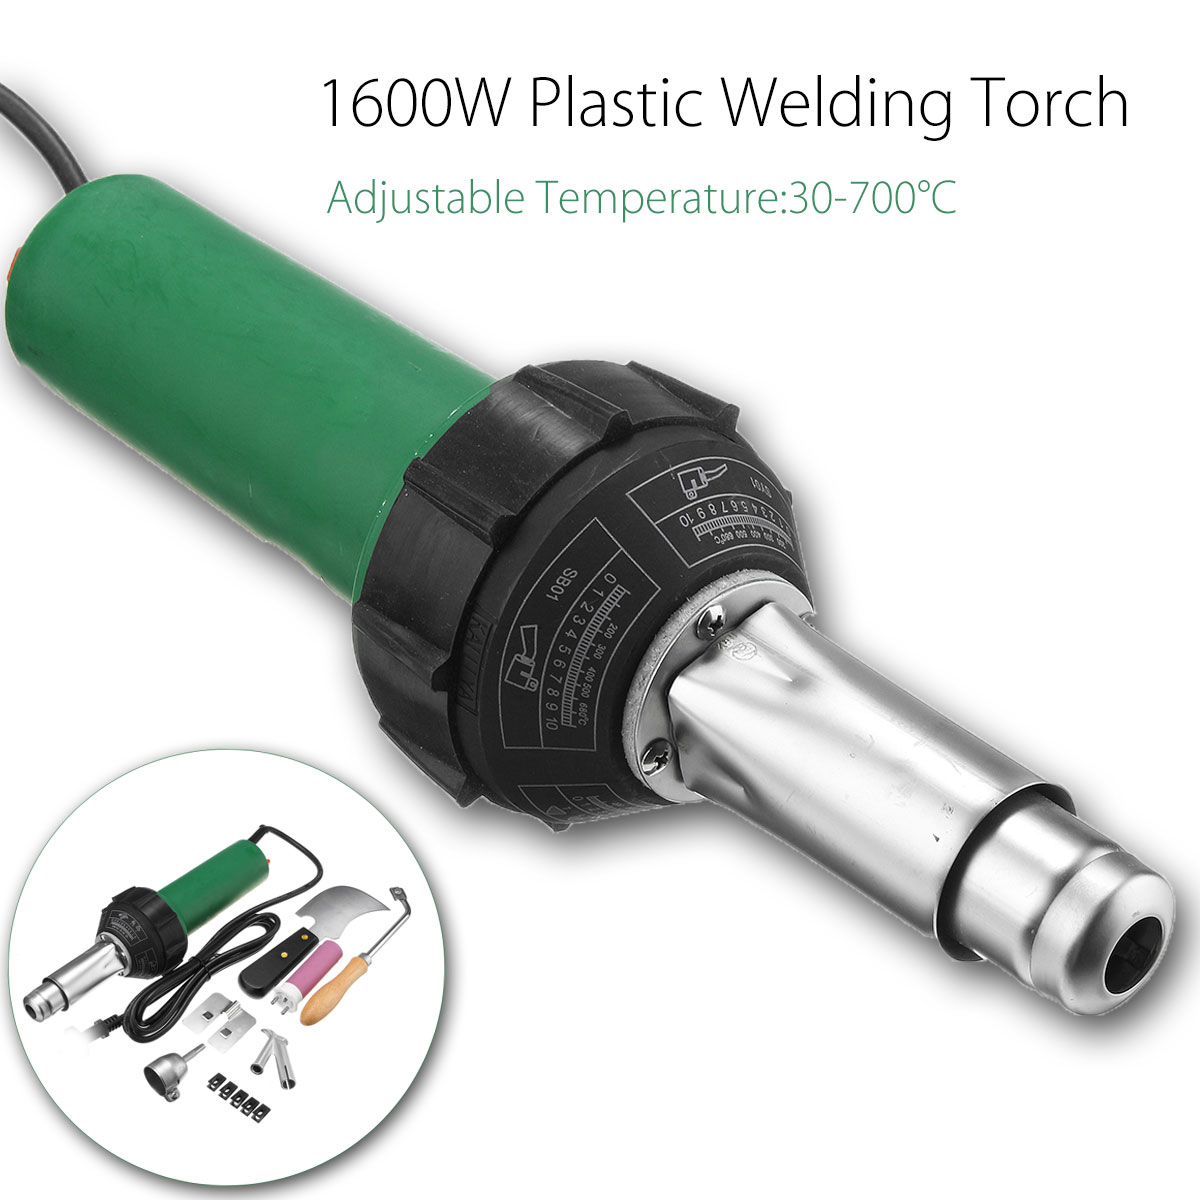 цена на 1600W 50/60HZ 220V Hot Air Plastic Welding Torch Gun Heat Gun With Heating Core Nozzles Welding Tools